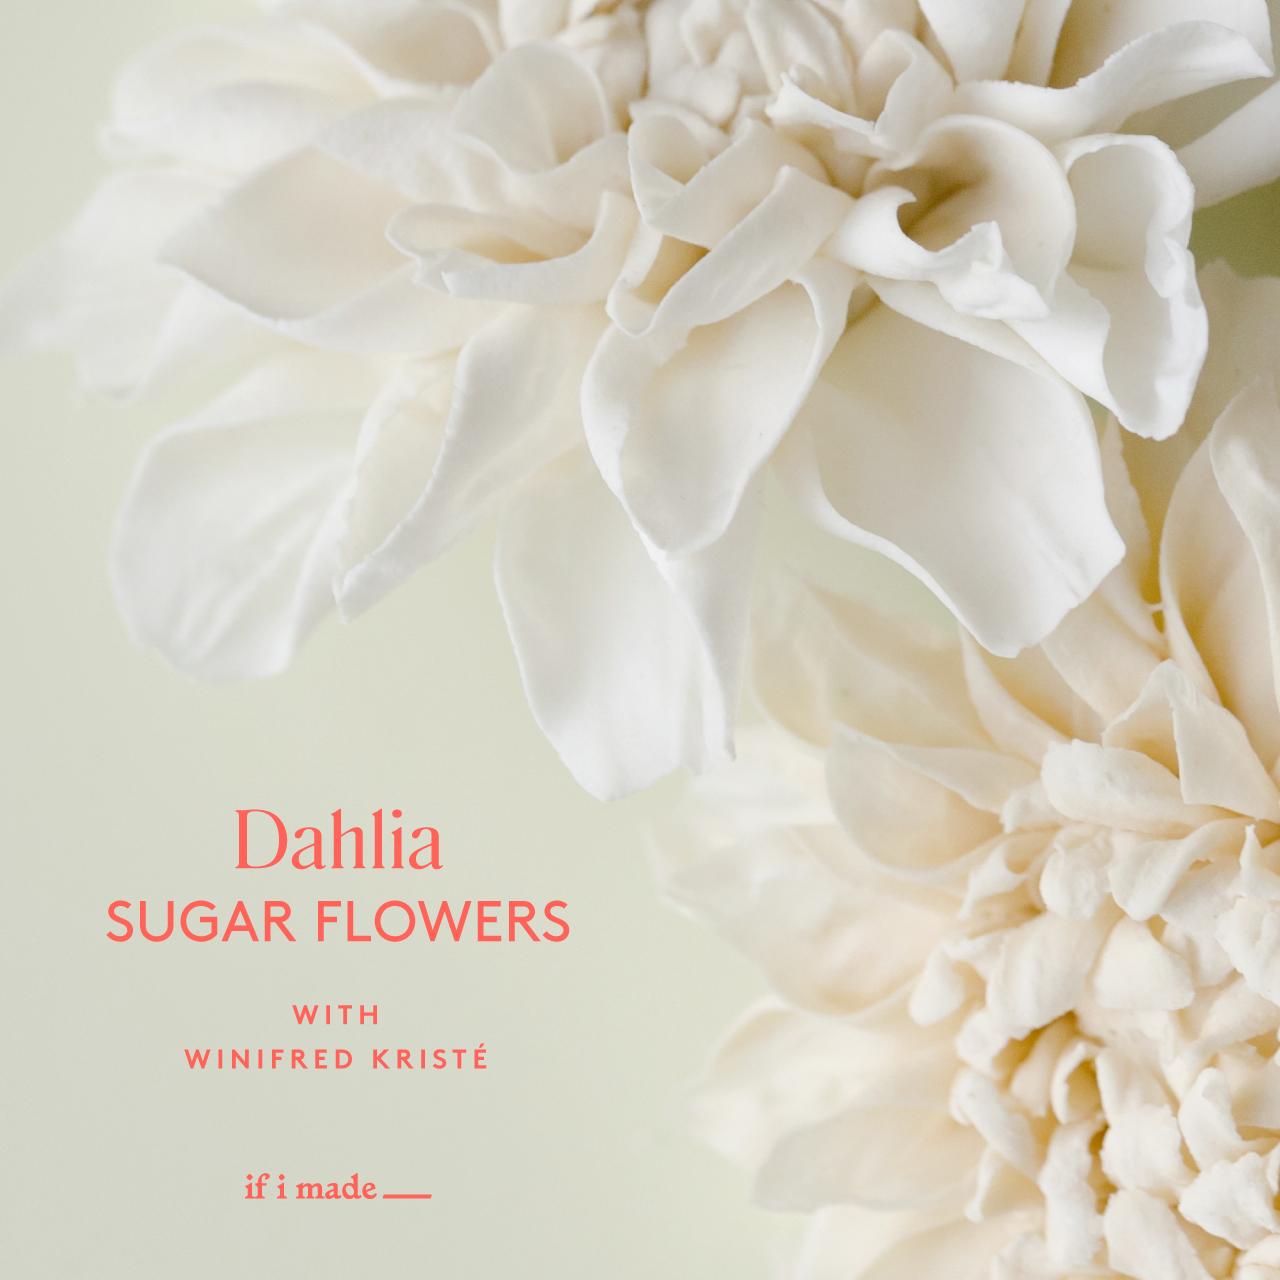 Dahlia Sugar Flowers with Winifred Kriste